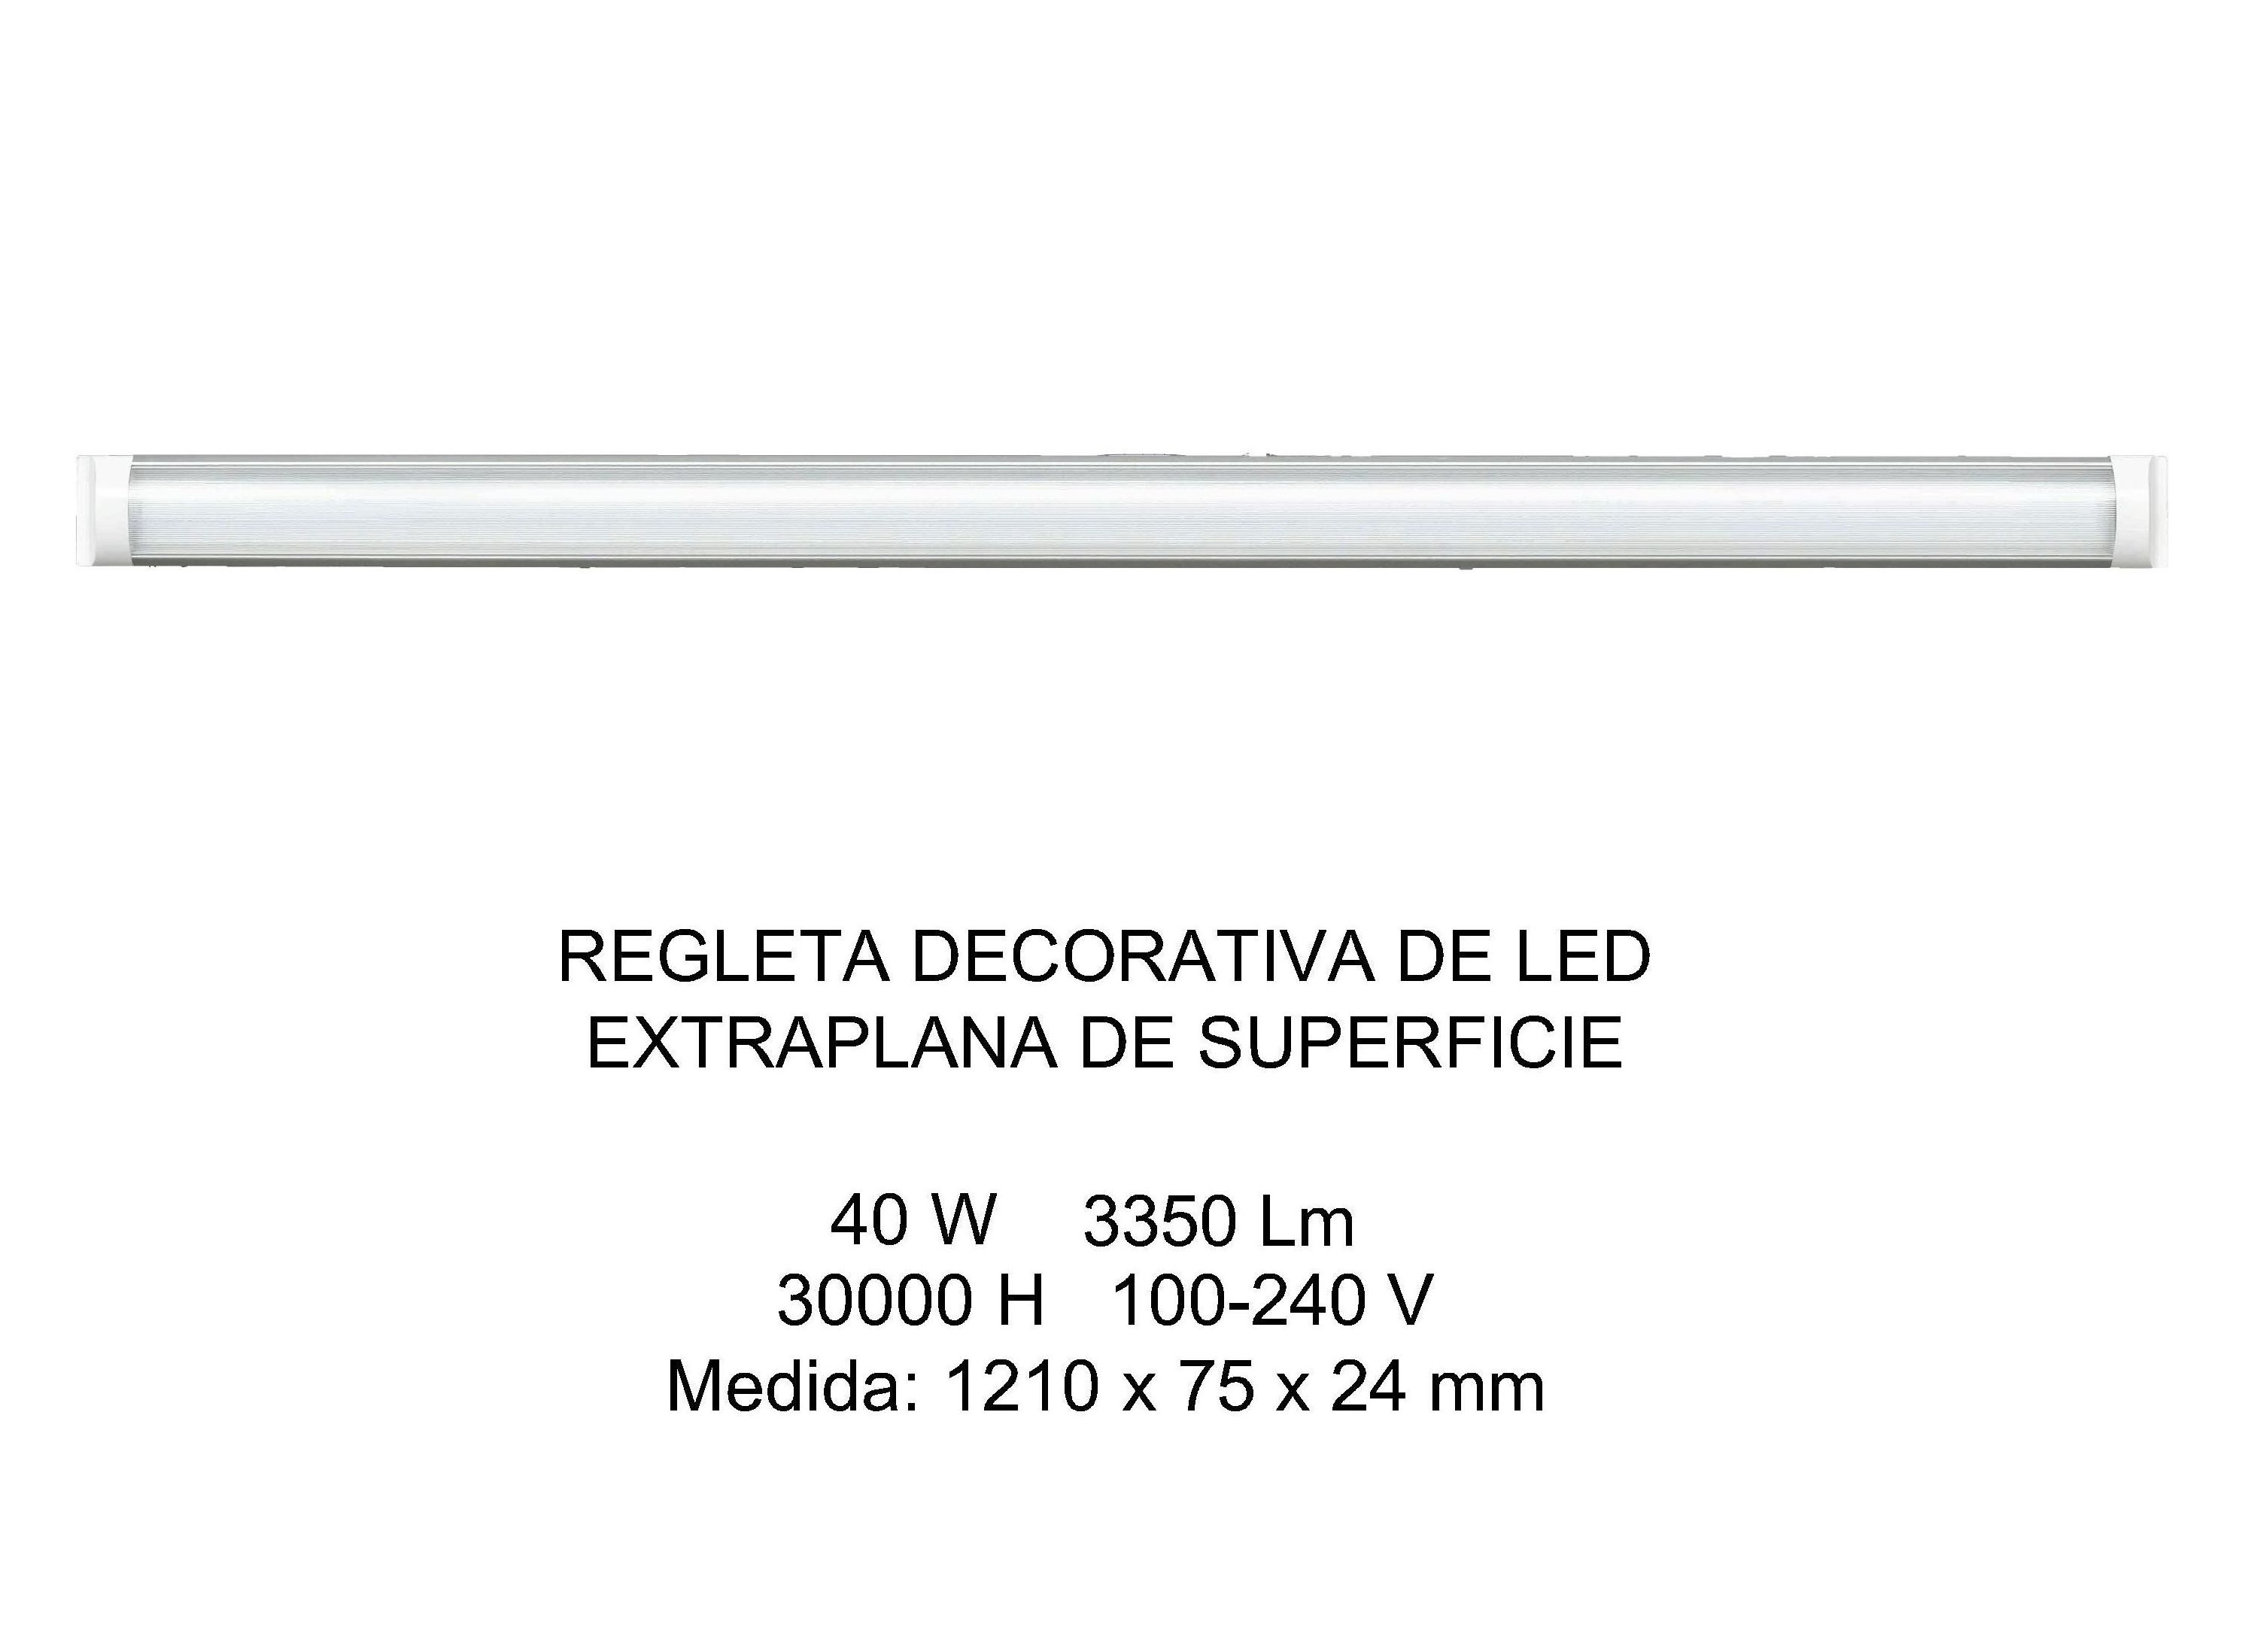 REGLETA LED 40W EXTRAPLANA